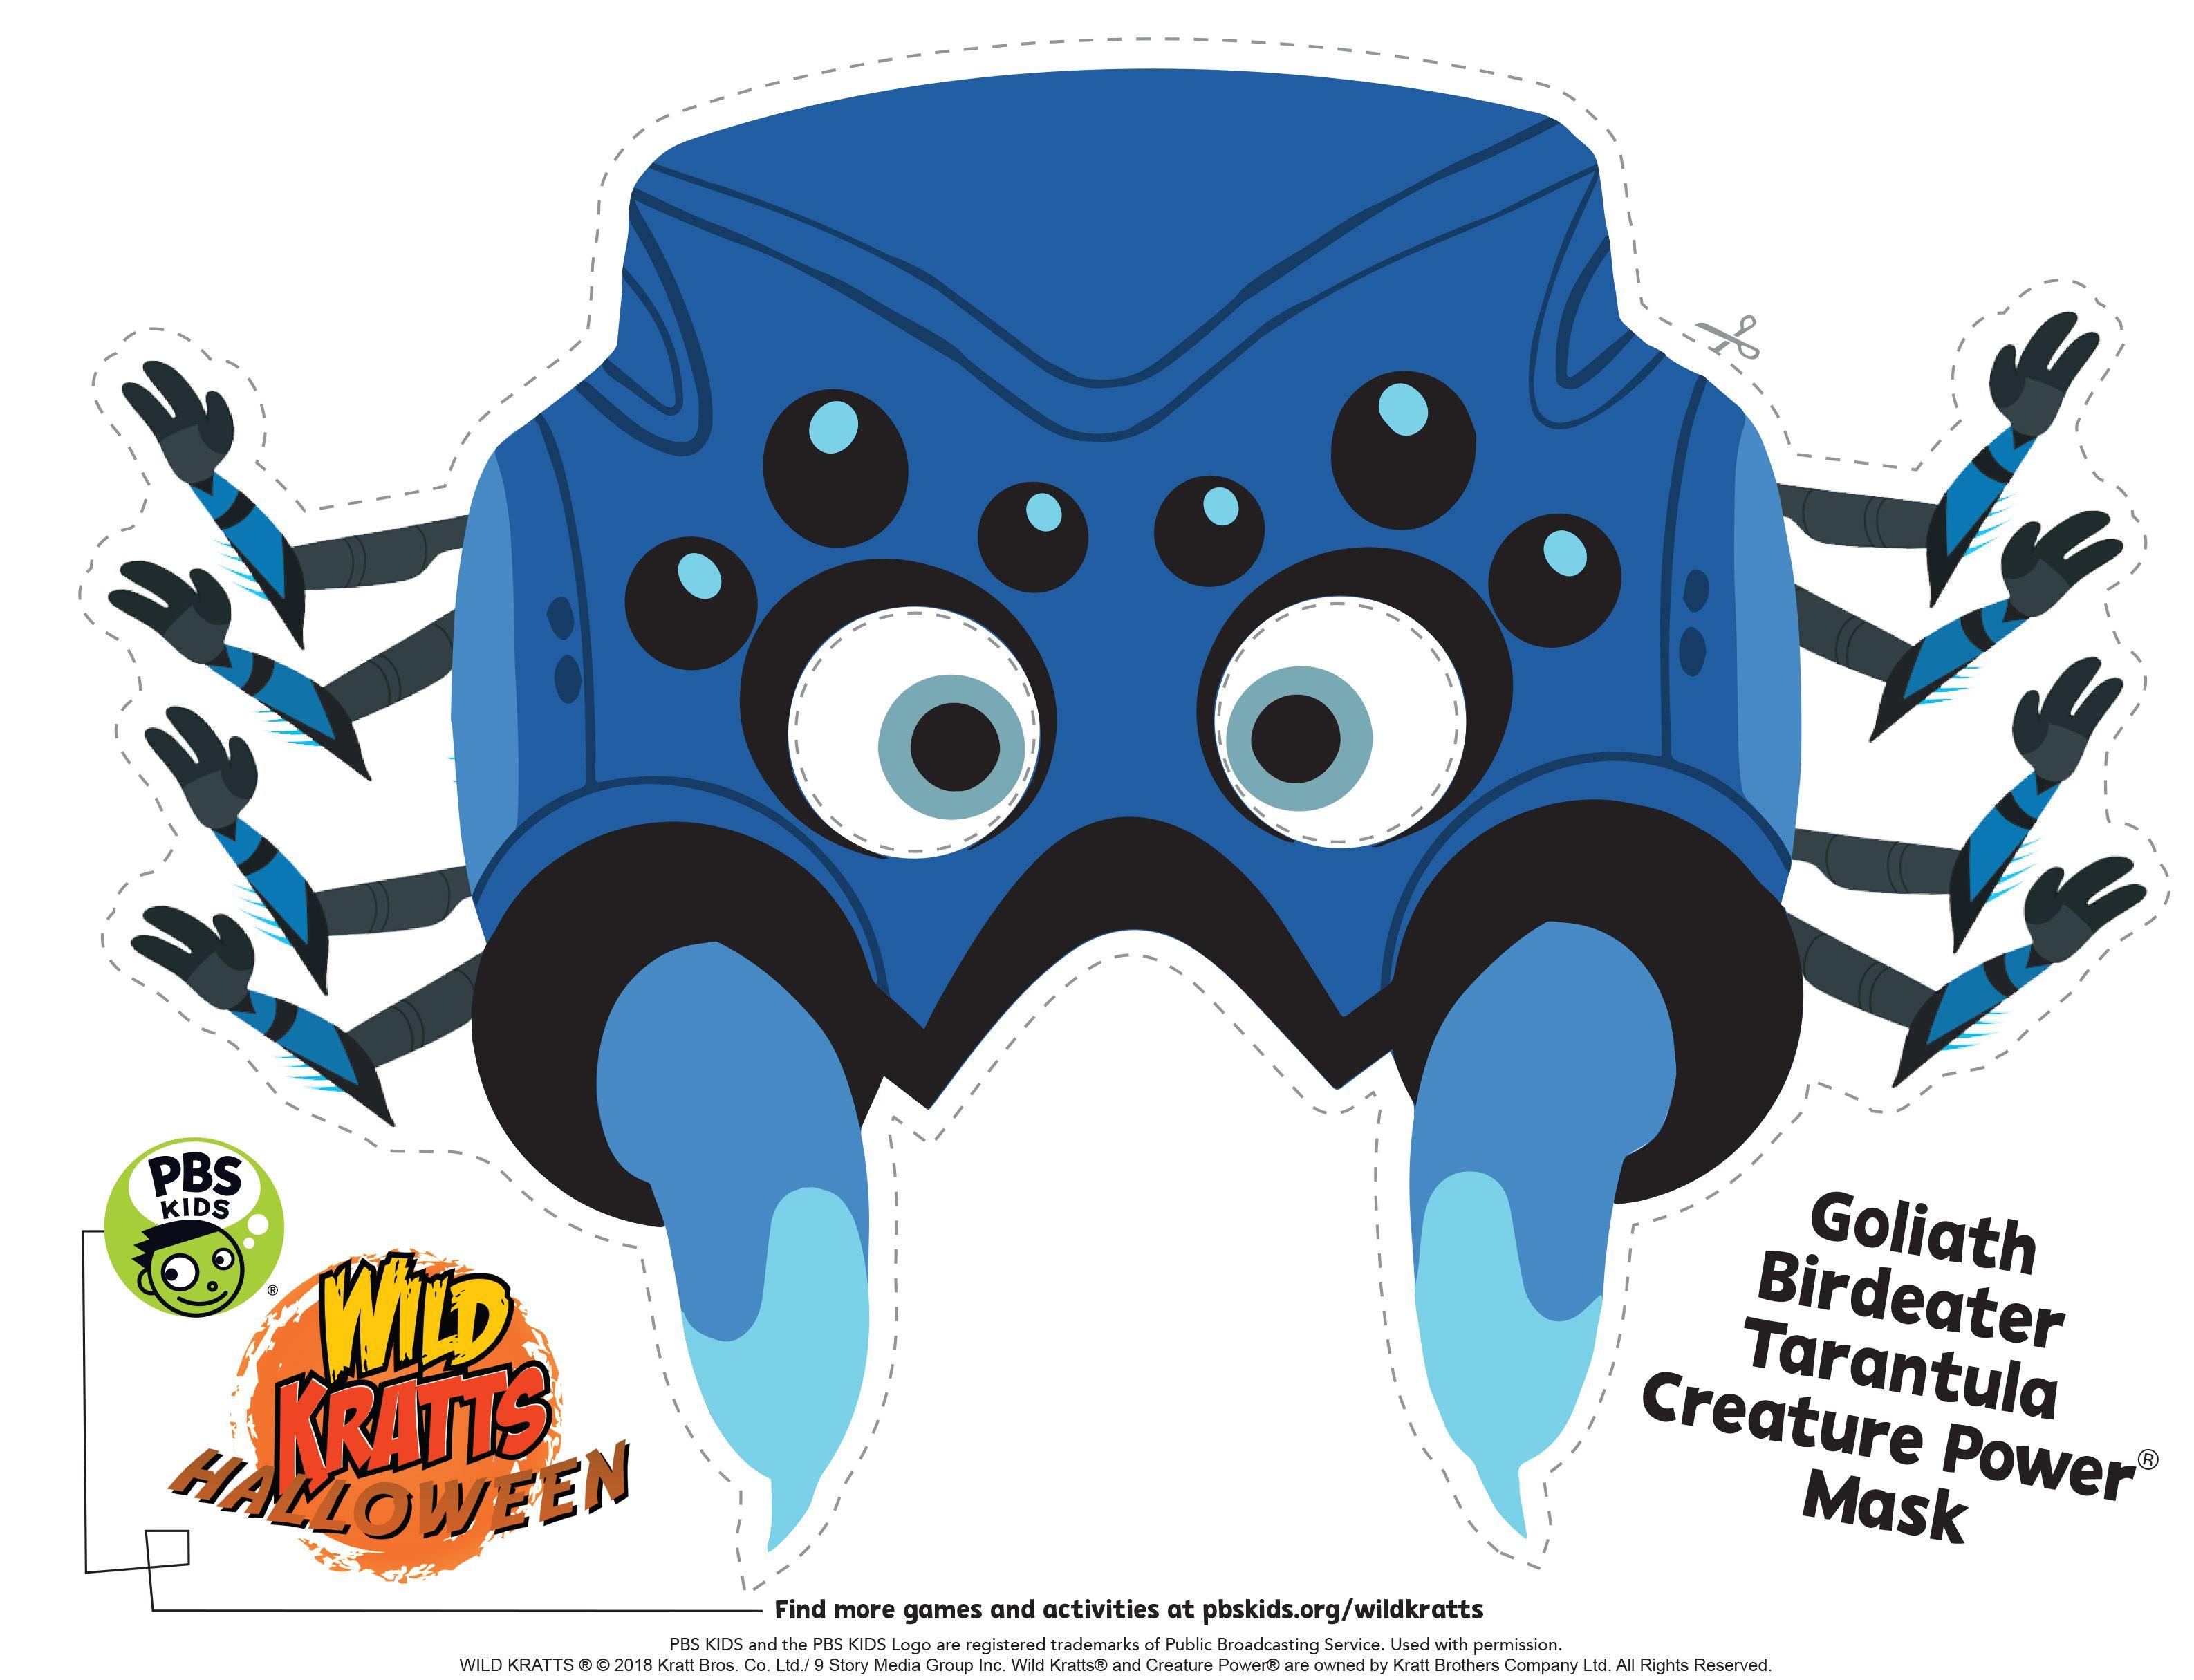 creepy tarantula spider halloween mask from wild kratts! #wildkratts